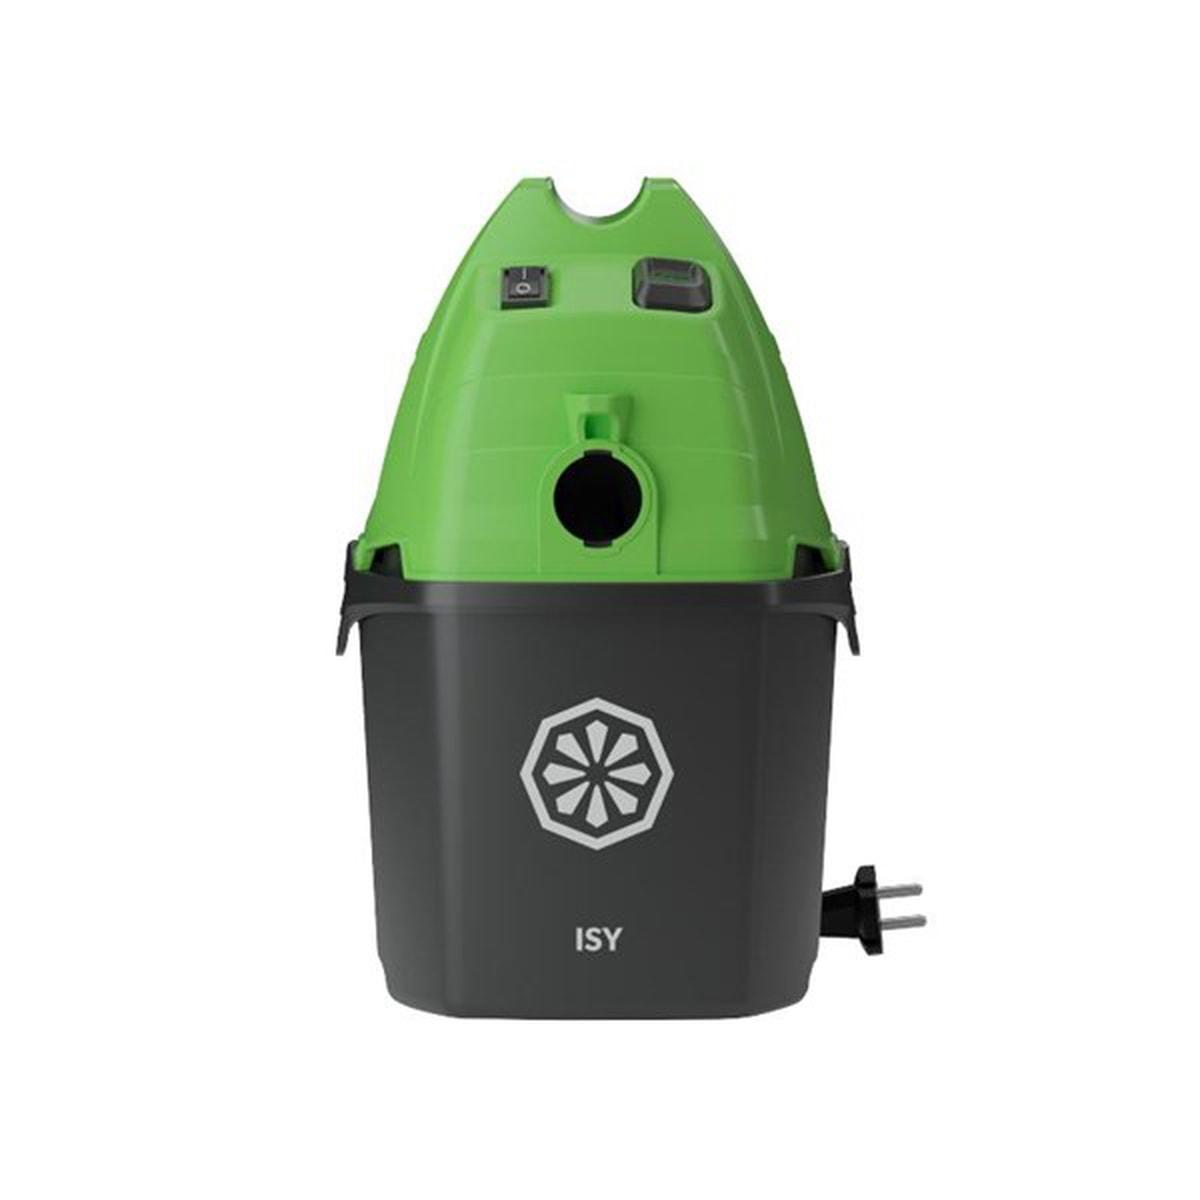 IPC Foma posefri støvsuger ISY elektrisk 190036